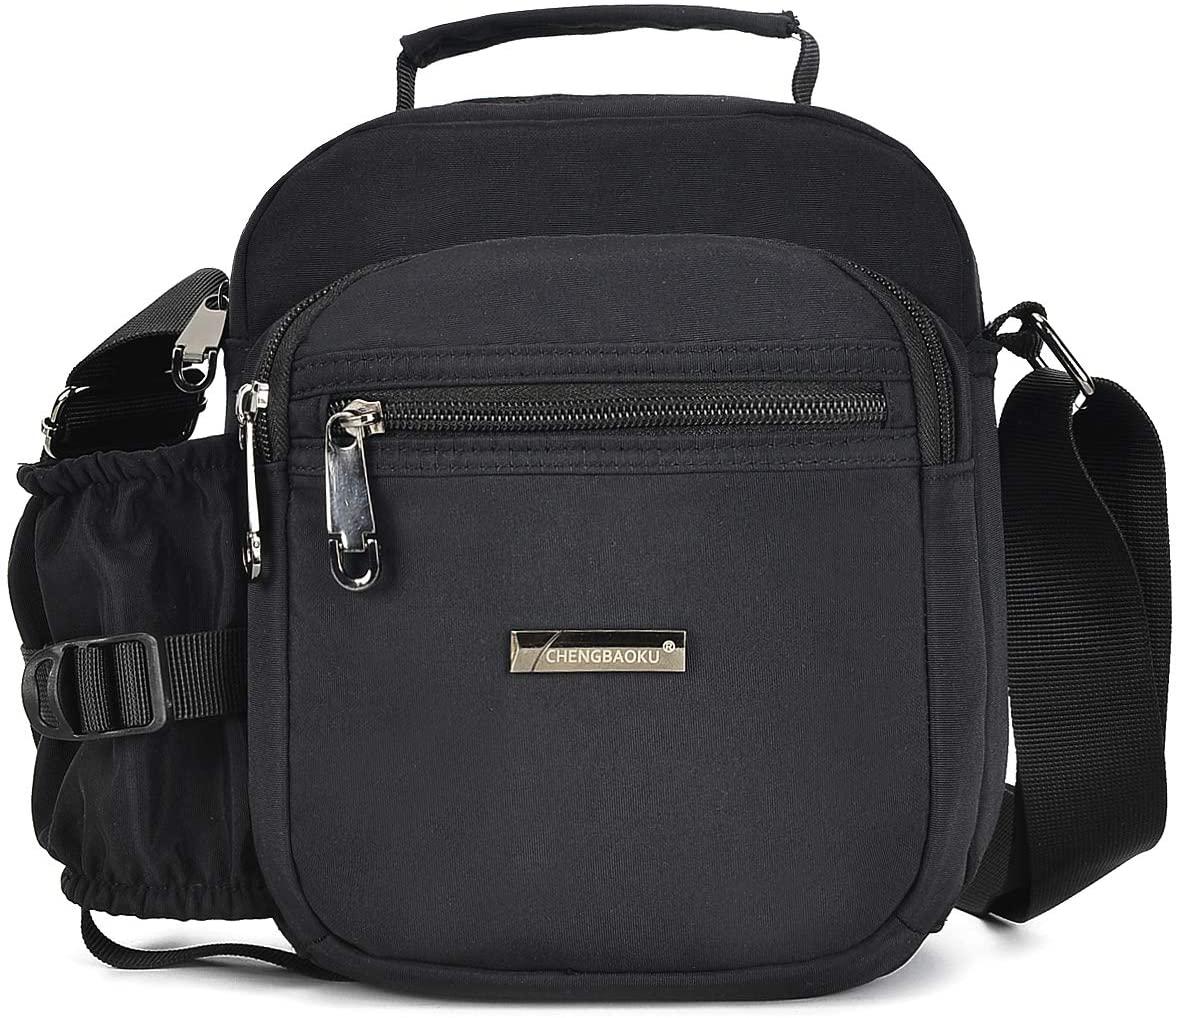 Wxnow Waterproof Shoulder Bag Messenger Bag Handbag for Men and Women (G-Black) Wxnow Men's Multifunctional Messenger Bag - Crossbody Shoulder Bags Women Casual Sling Pack for Everyday Use (G-Black)